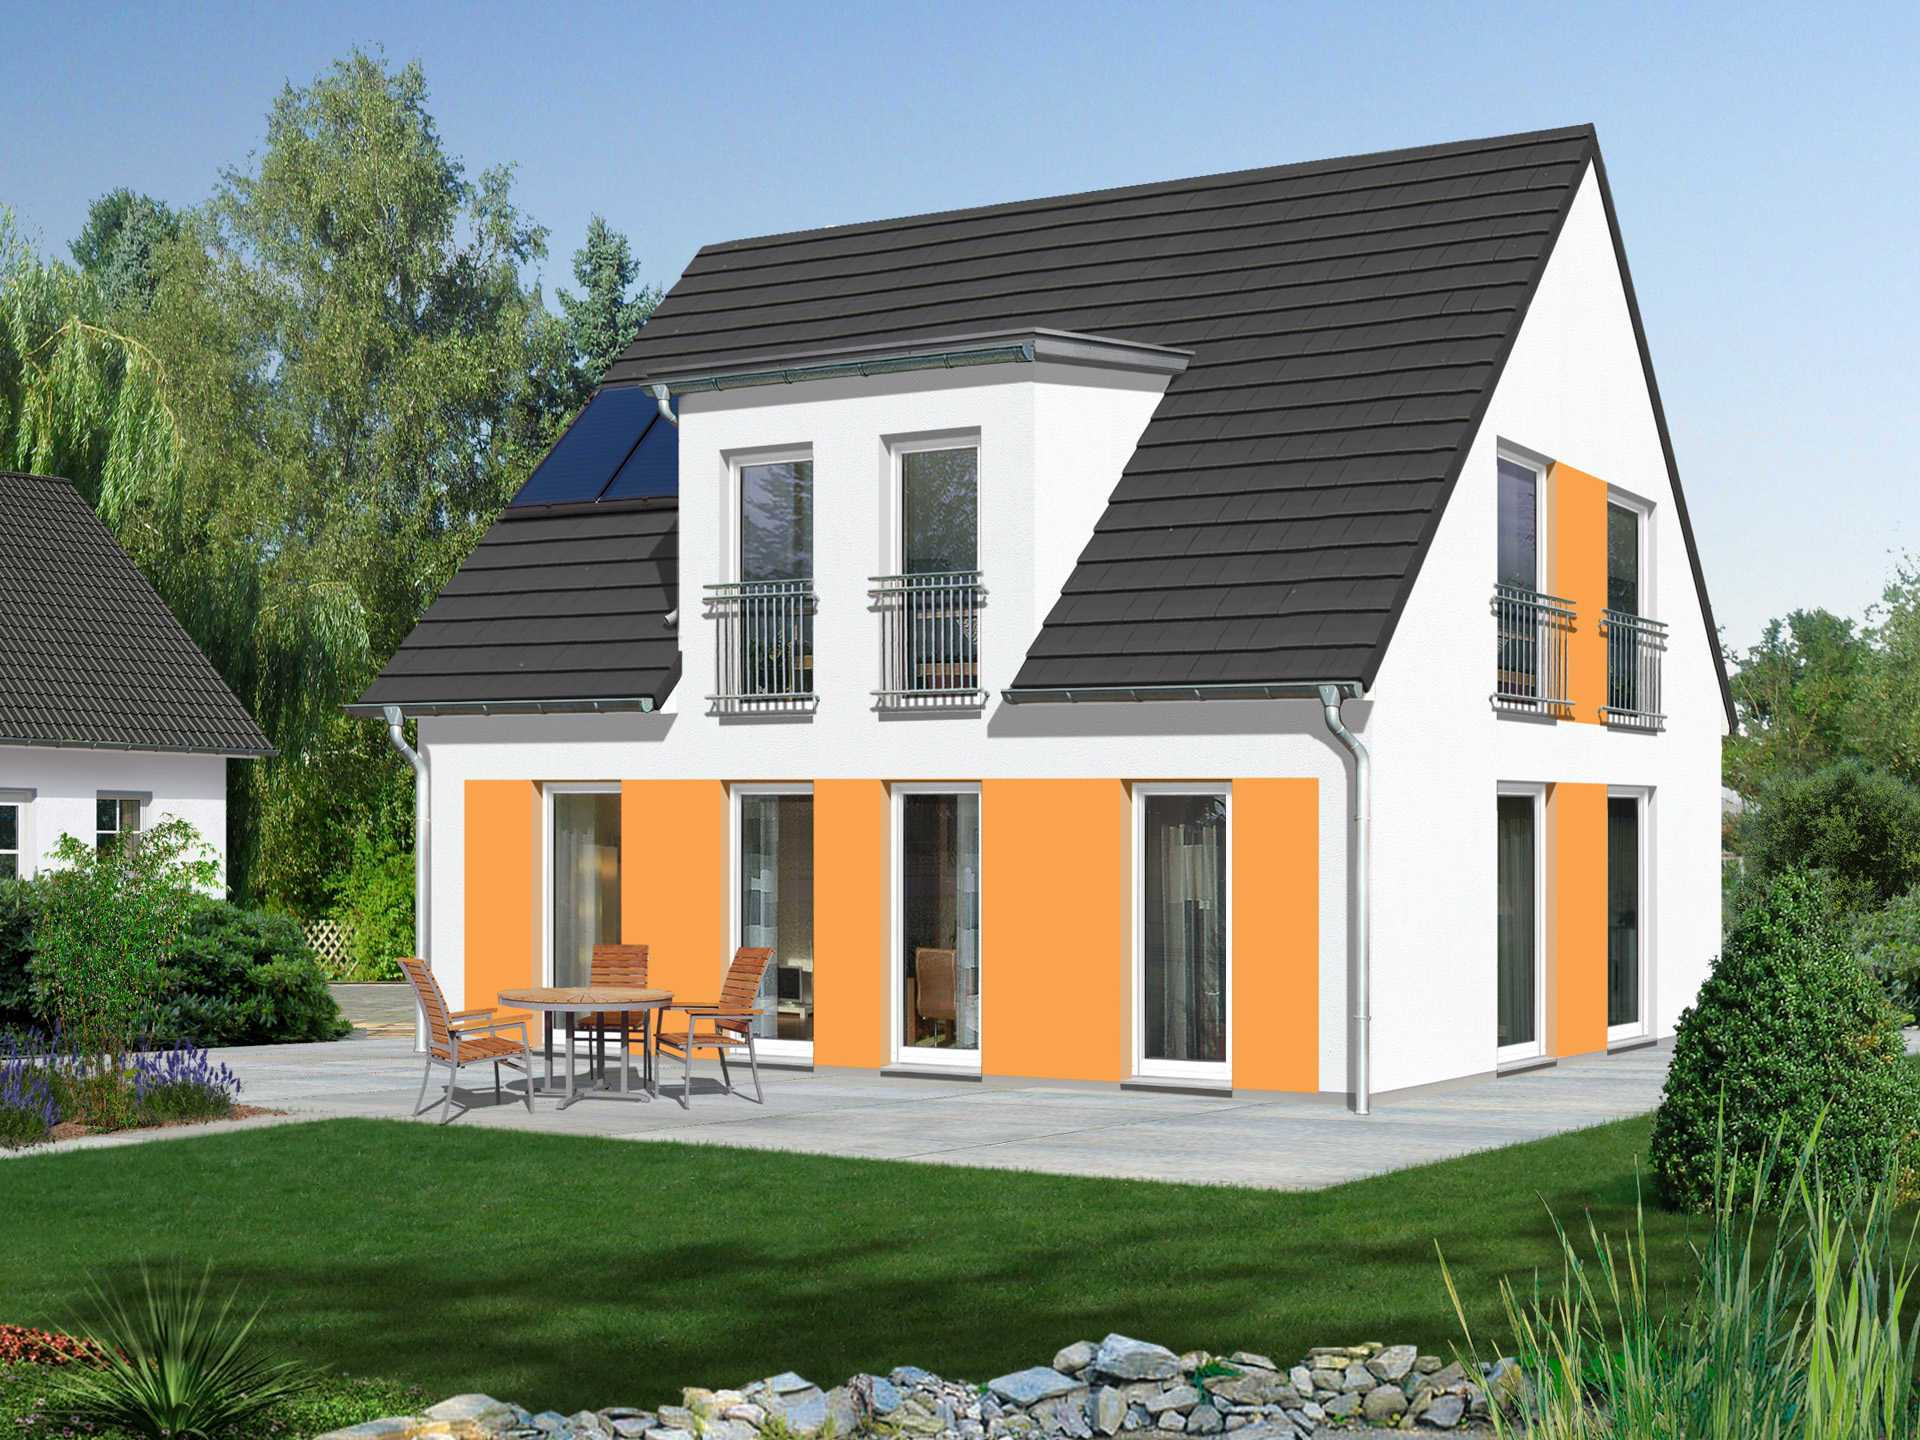 Haus Flair 113 Trend von Nickol Hausbau - Town & Country Partner